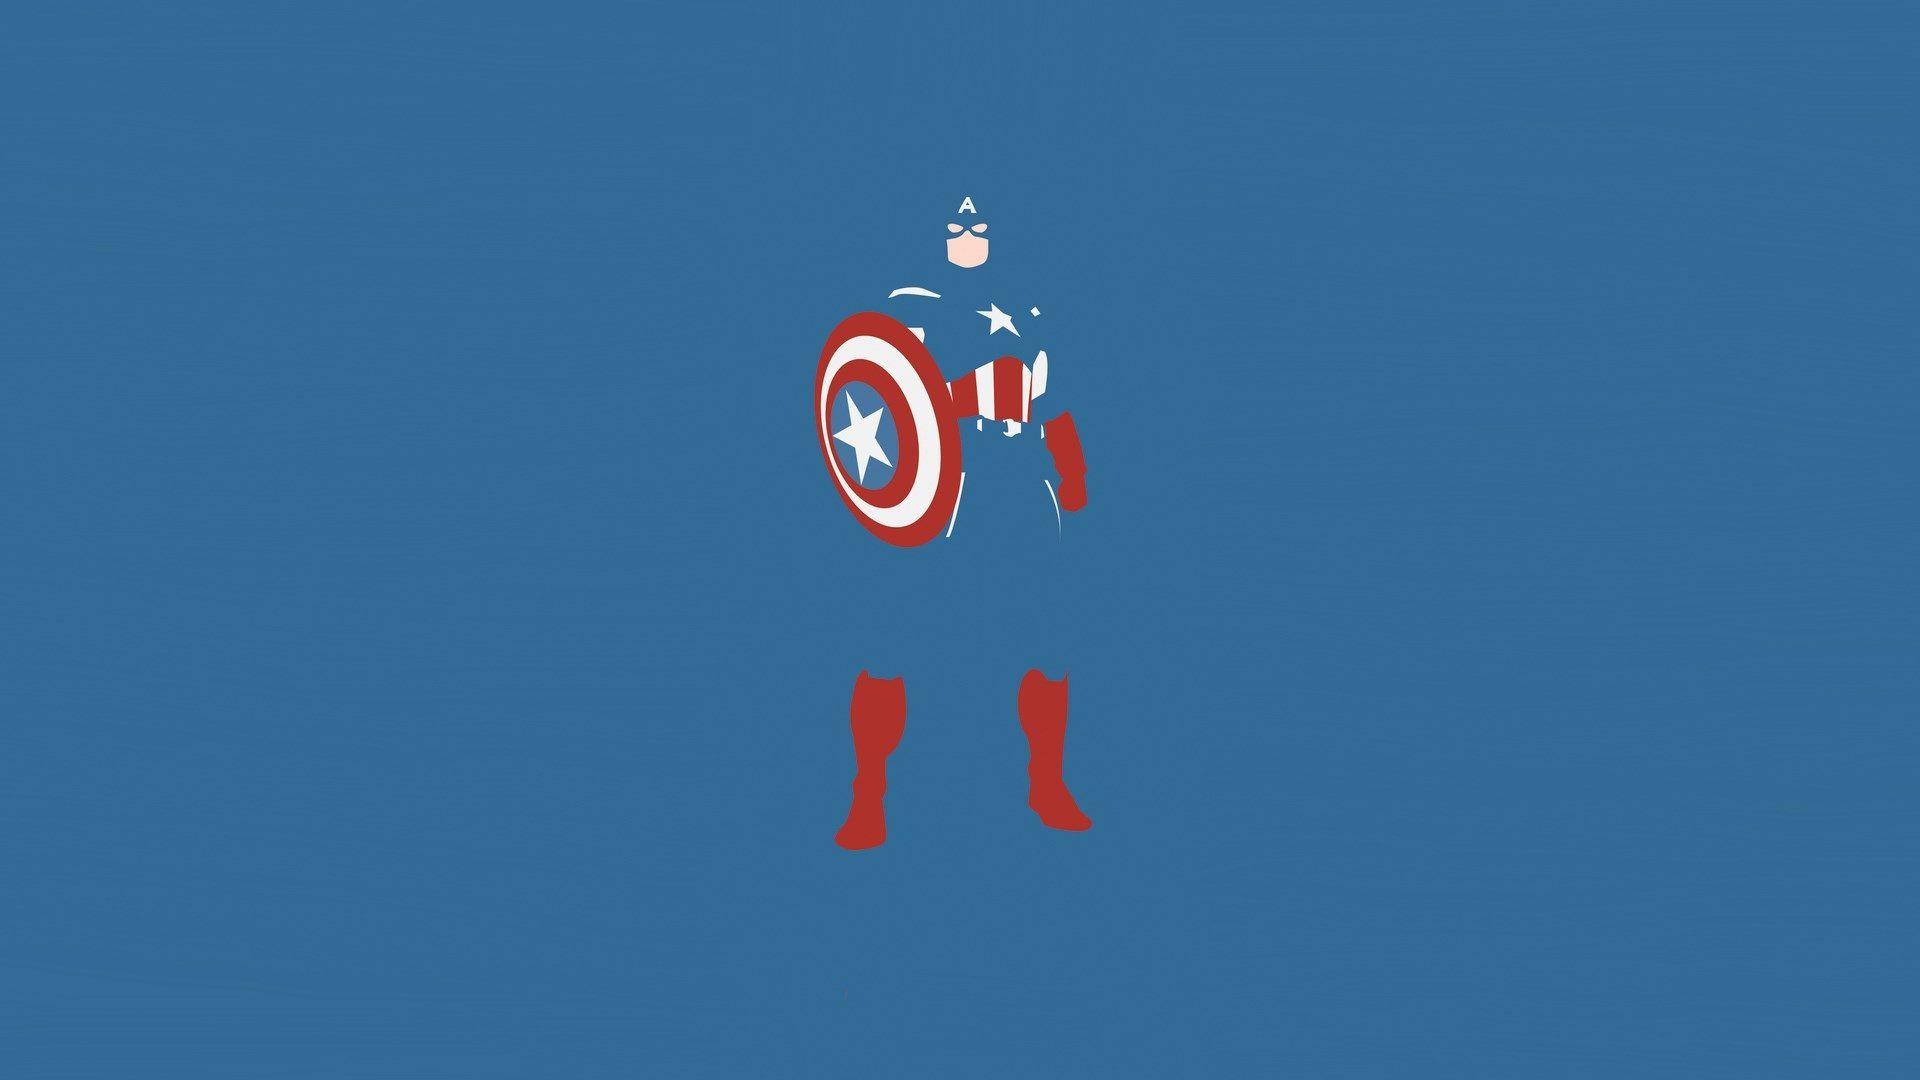 1920x1080 Captain America Hd Wallpaper Background